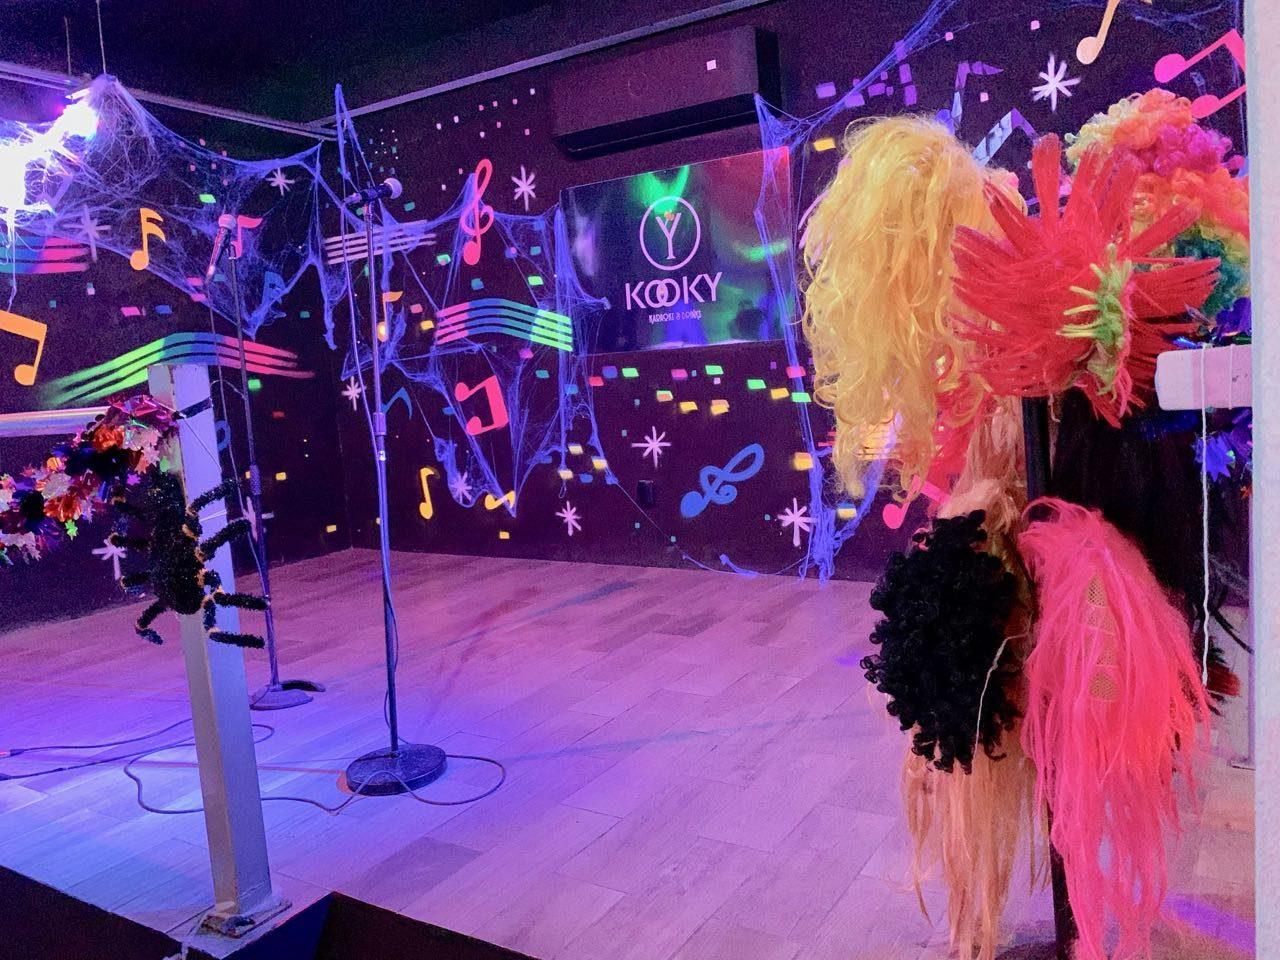 Gay Bars Puerto Vallarta: Sing your heart out at Kooky Karaoke.